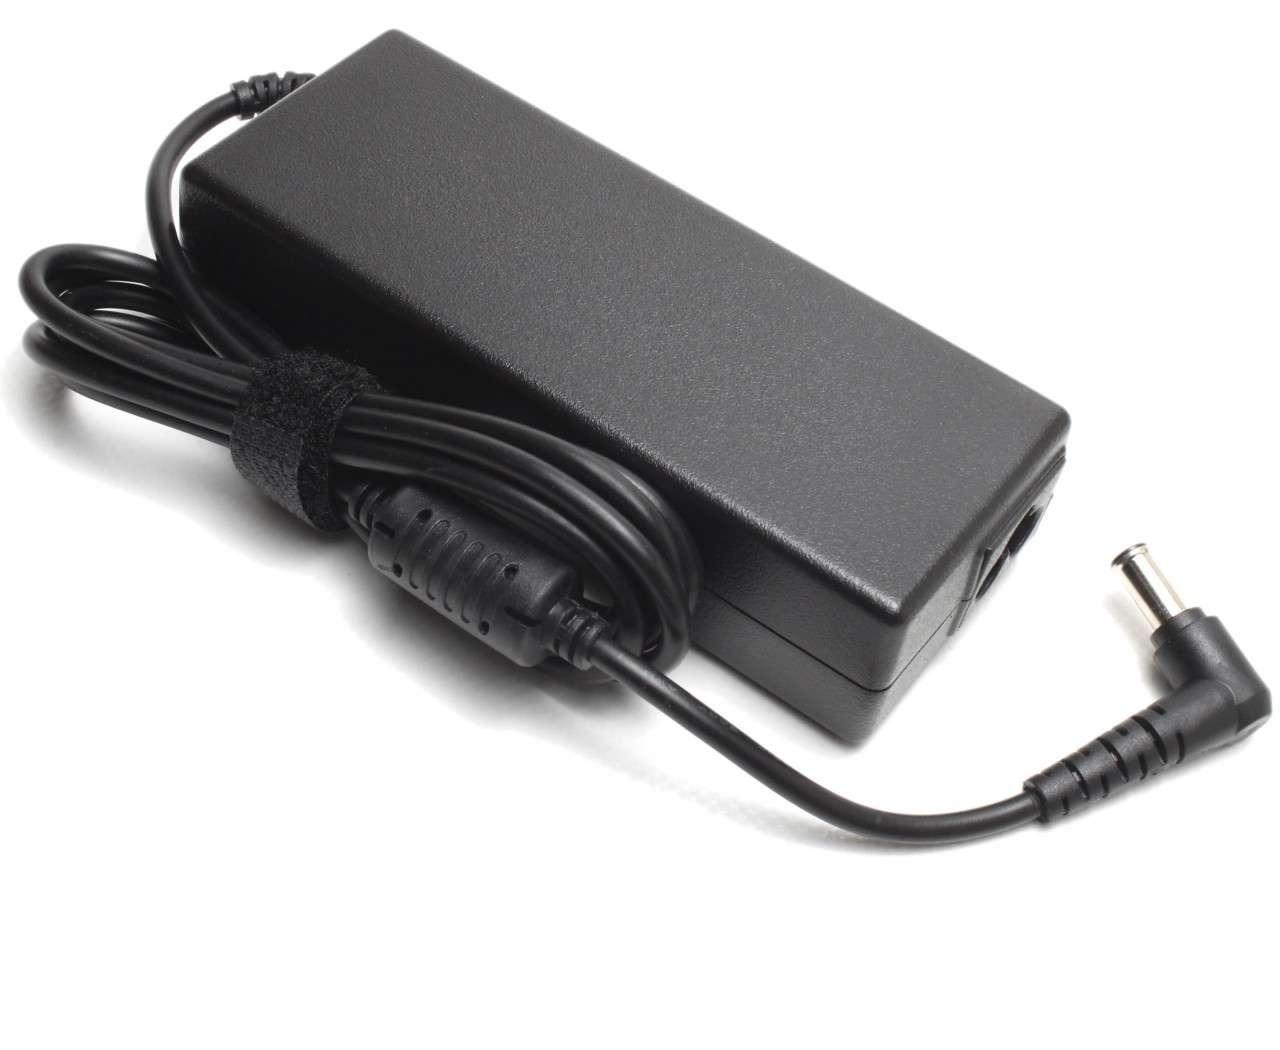 Incarcator Sony Vaio VPCEB2FFX Replacement imagine powerlaptop.ro 2021